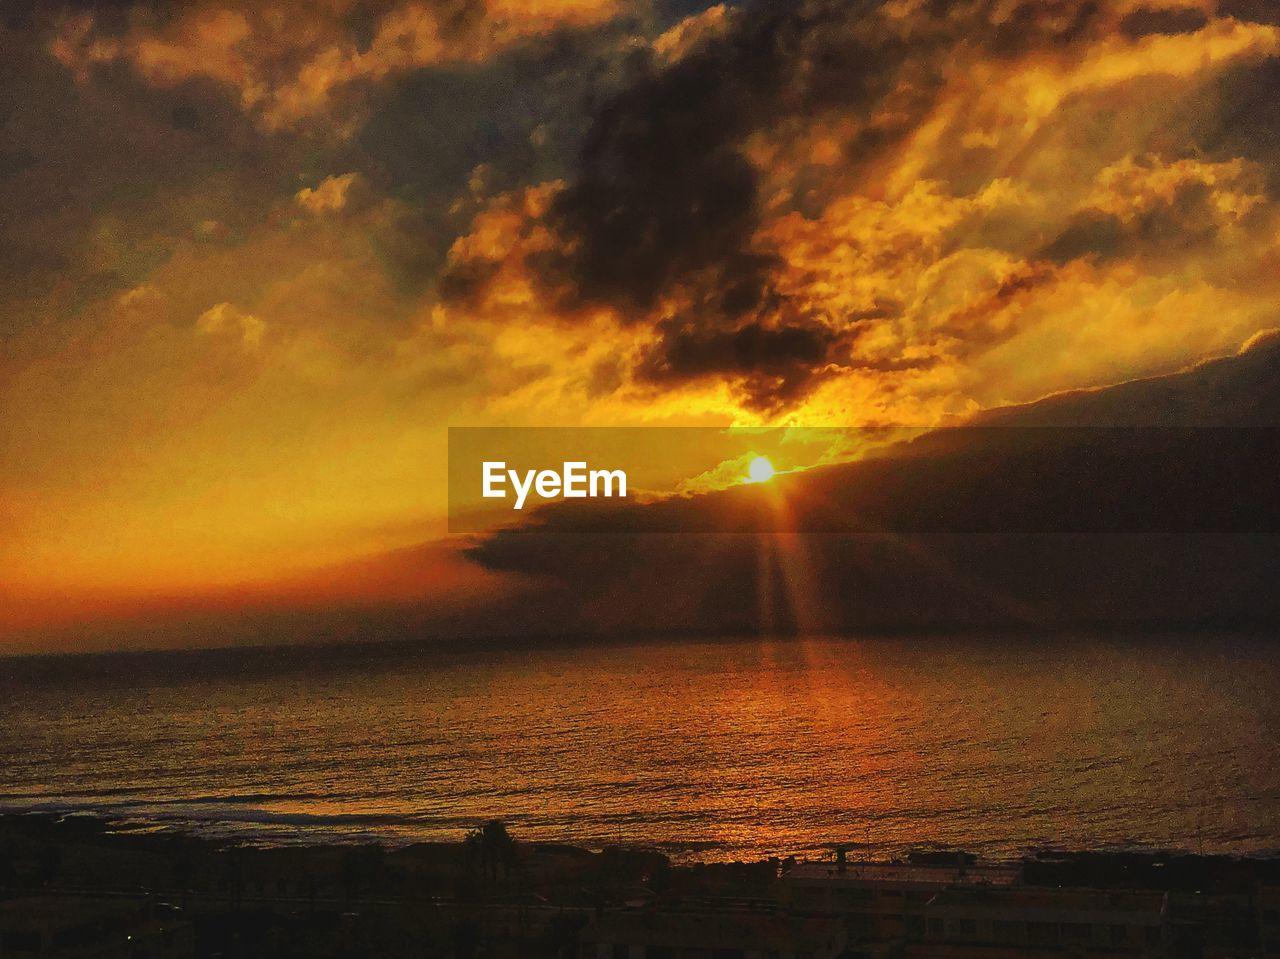 sky, sunset, cloud - sky, water, beauty in nature, scenics - nature, sea, tranquility, tranquil scene, orange color, sun, sunlight, sunbeam, horizon over water, horizon, nature, no people, idyllic, lens flare, outdoors